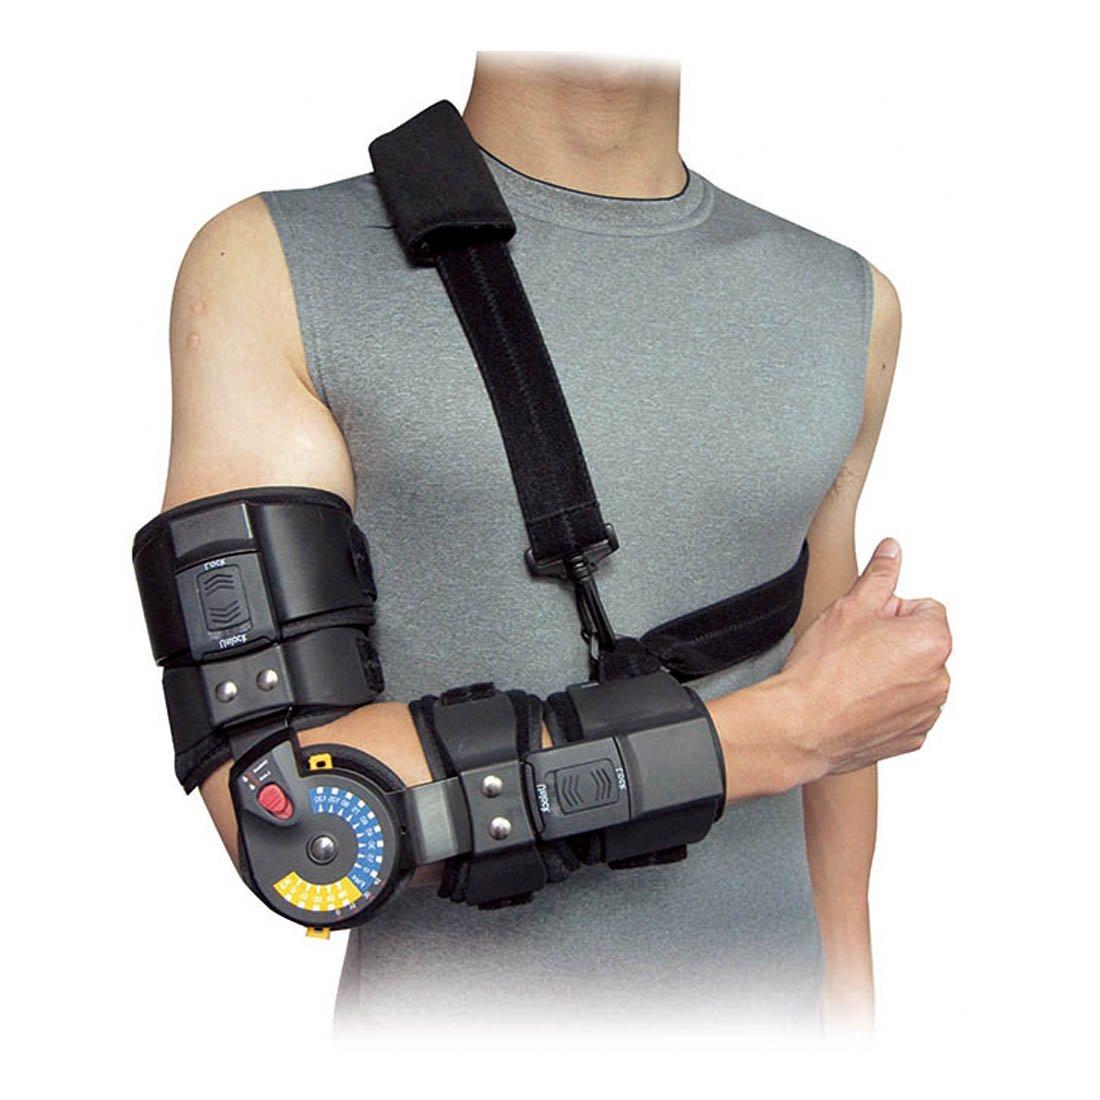 Orthomen ROM Elbow Brace with Sling - Size: Universal (Left)